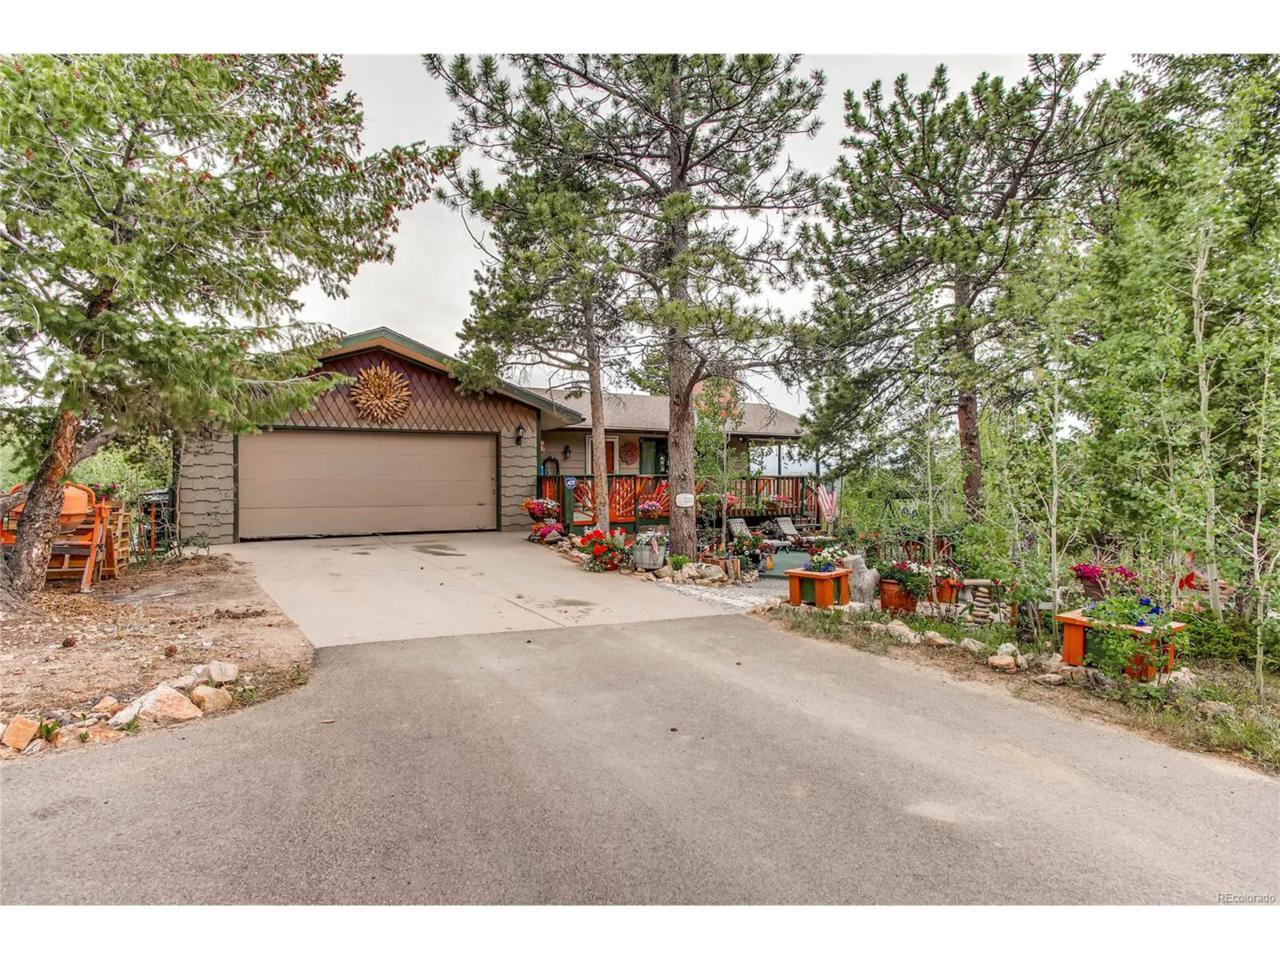 476 Evergreen Road, Black Hawk, CO 80422 (MLS #5310862) :: 8z Real Estate